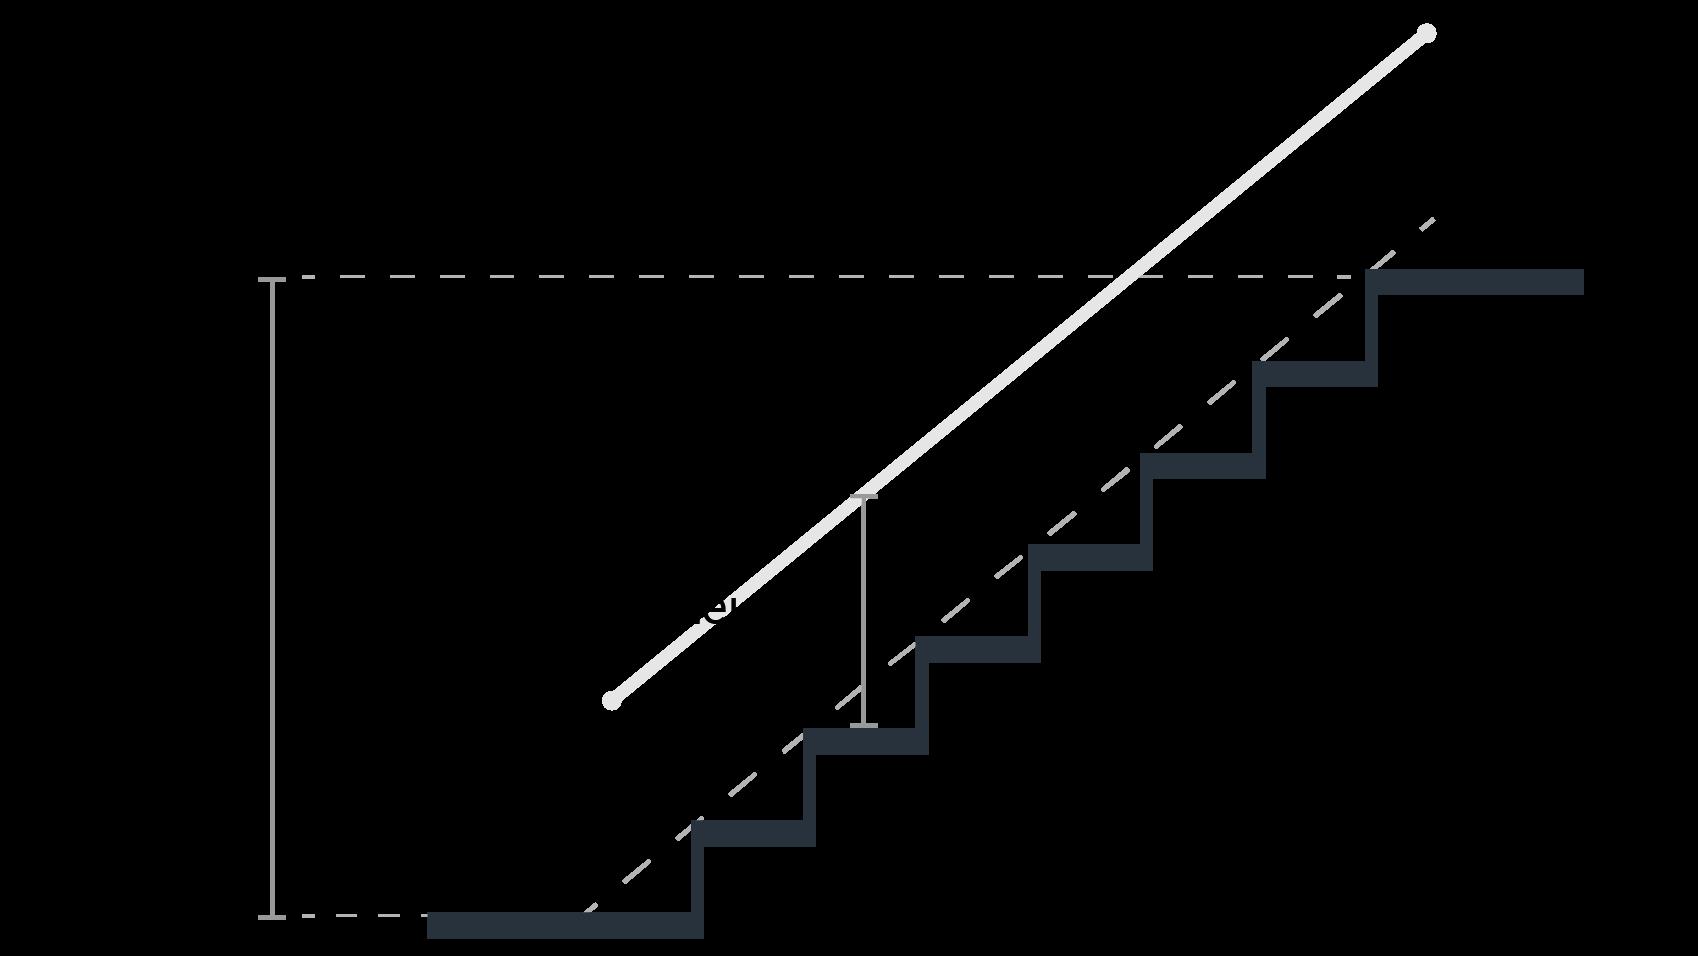 trap leuning, klimhoogte en klimlijn